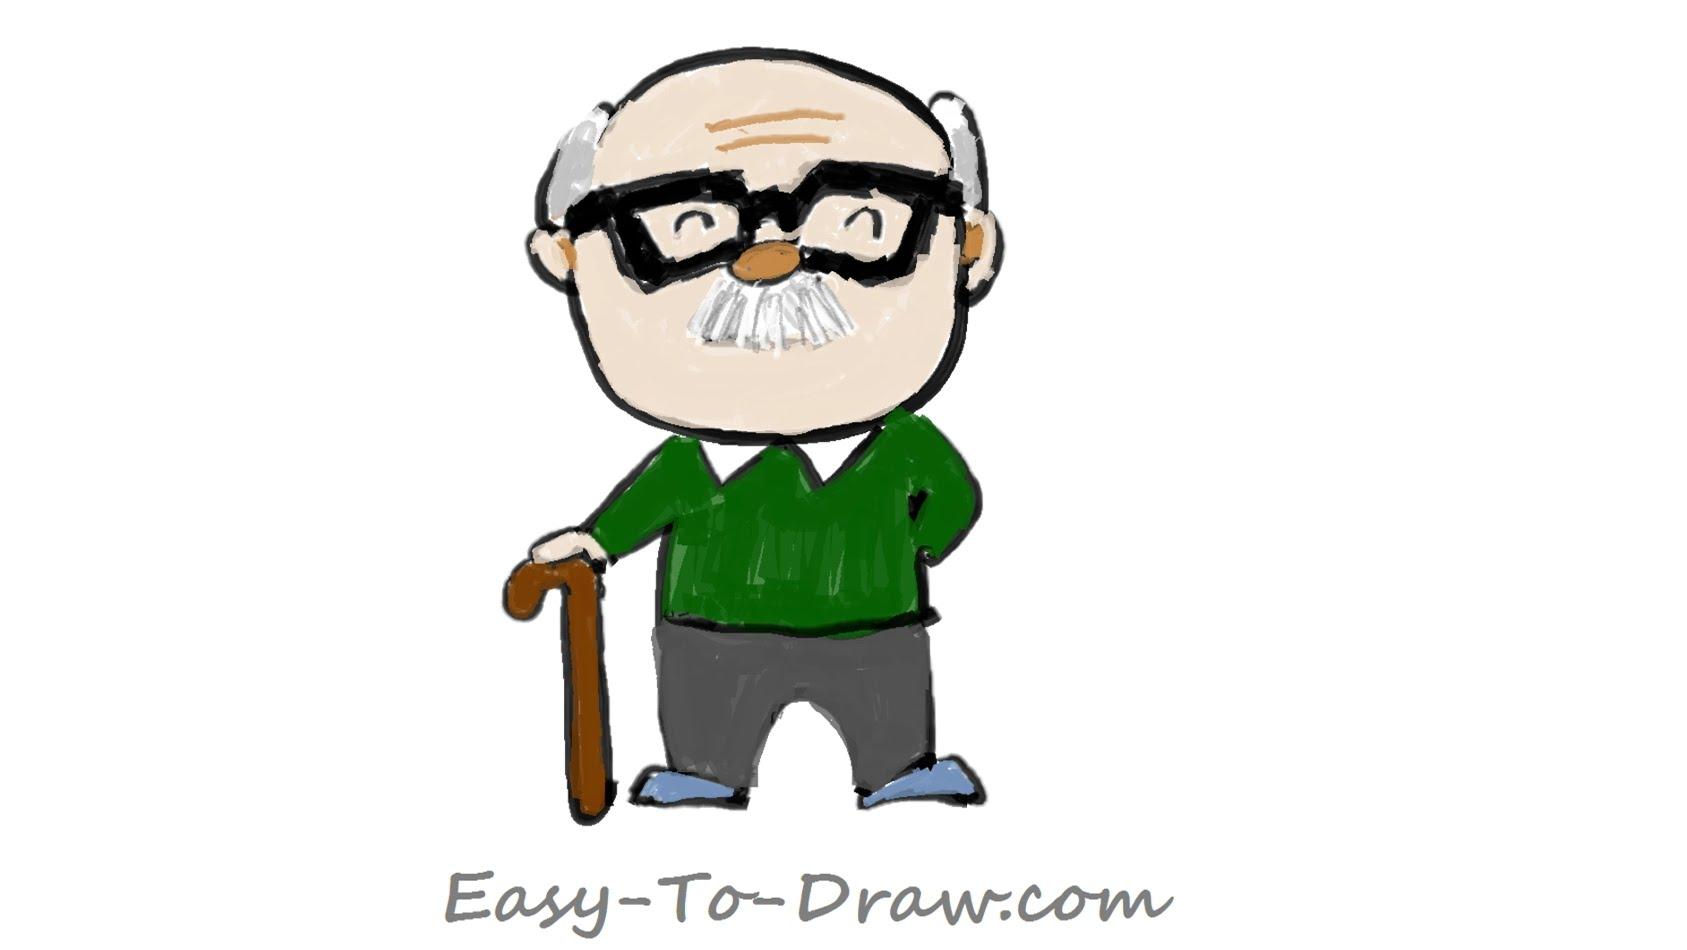 Drawn trophy animated Step draw Kids (grandfather) How